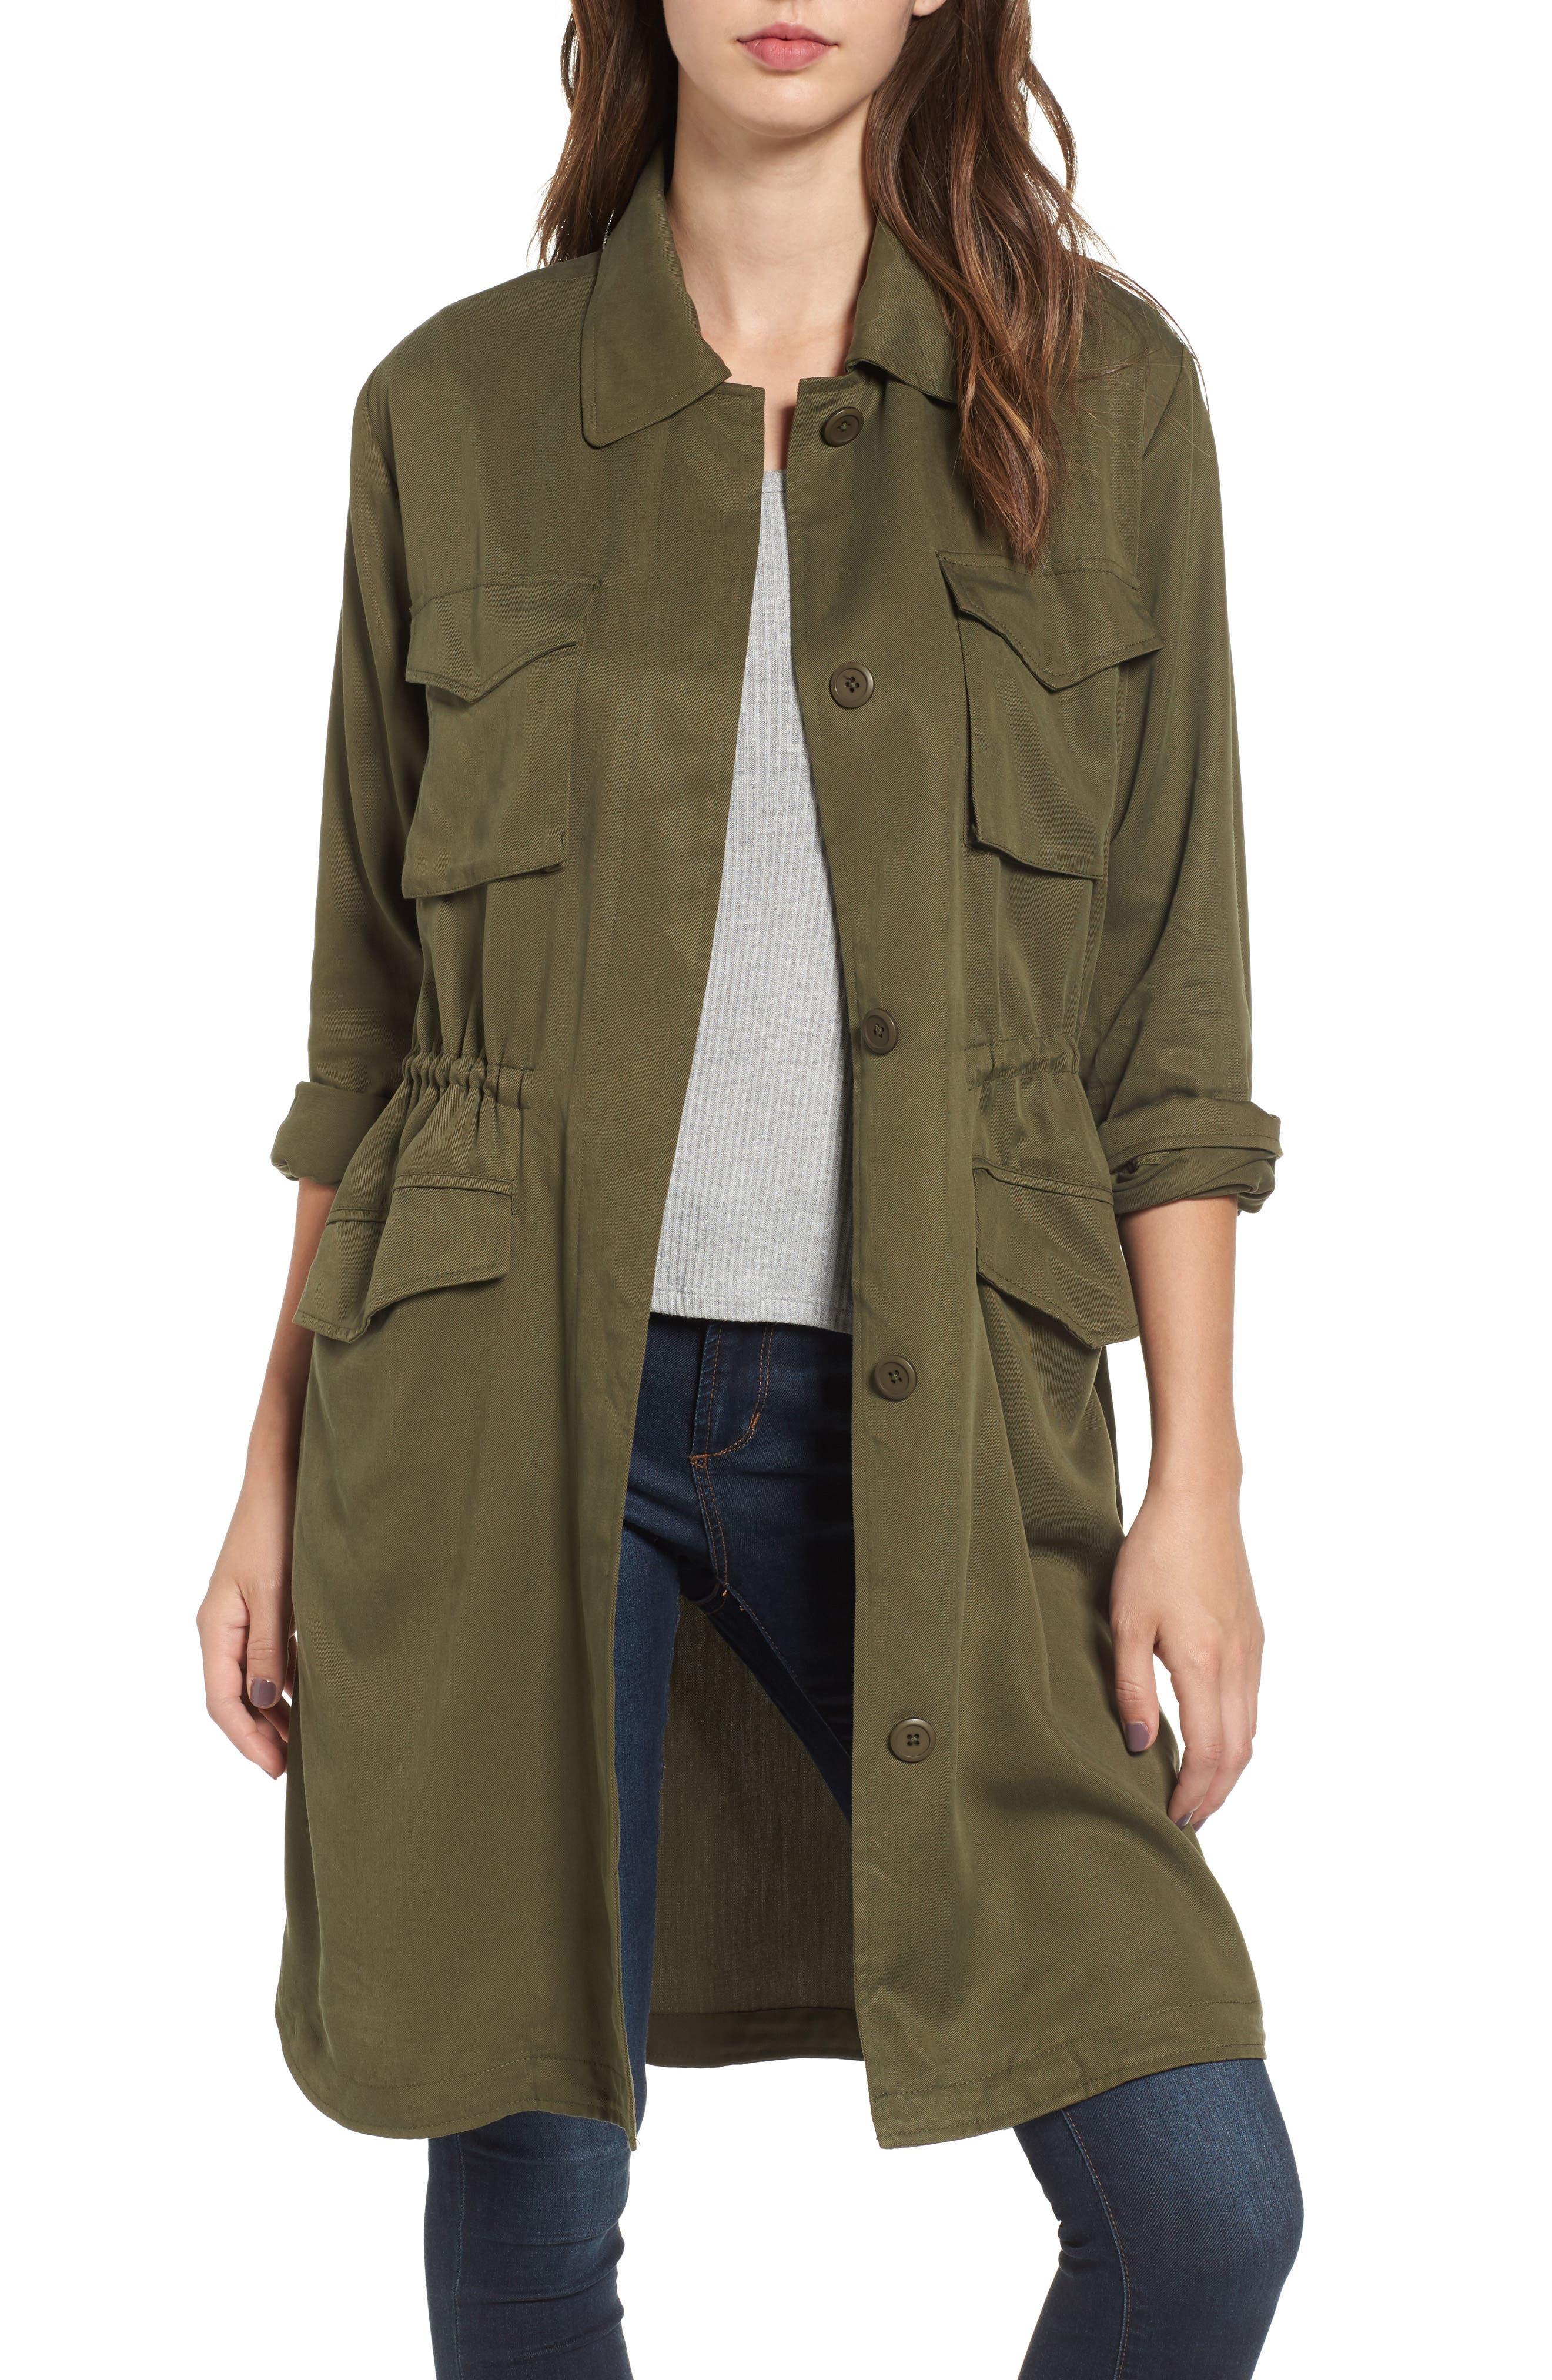 BB Dakota Averie Drawstring Waist Army Coat